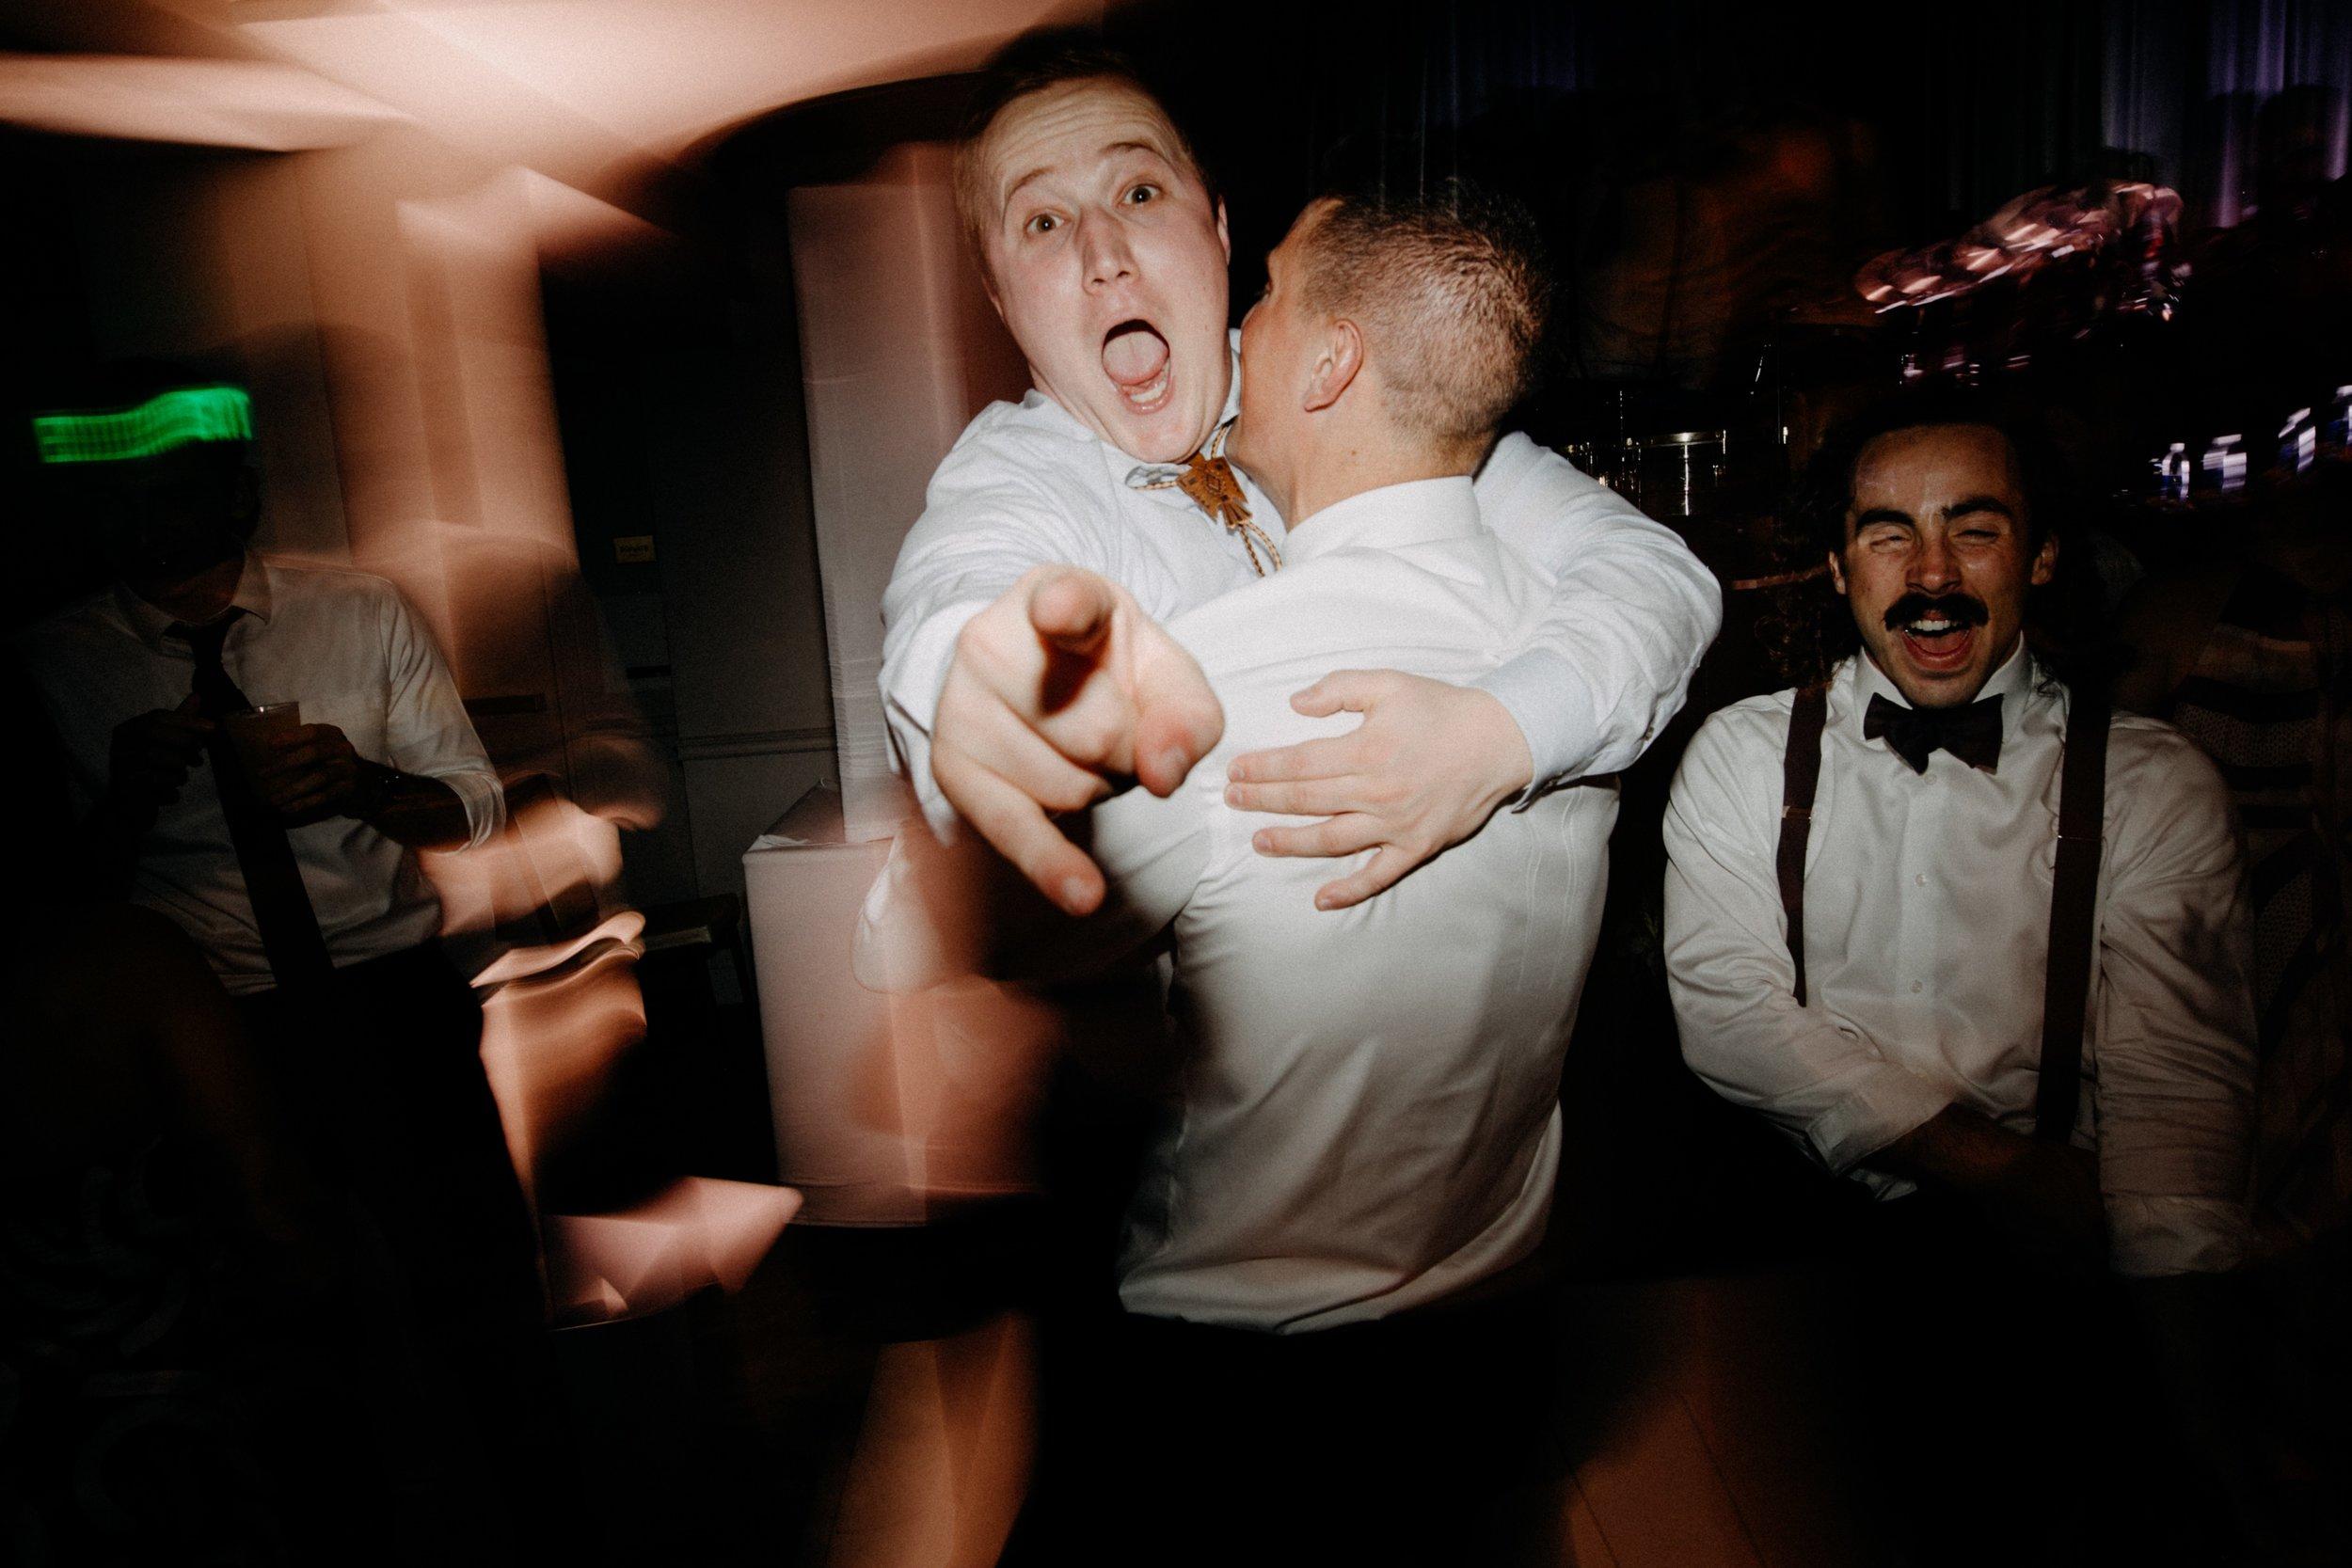 st-anthony-hotel-wedding-photography-10181san-antonio.JPG